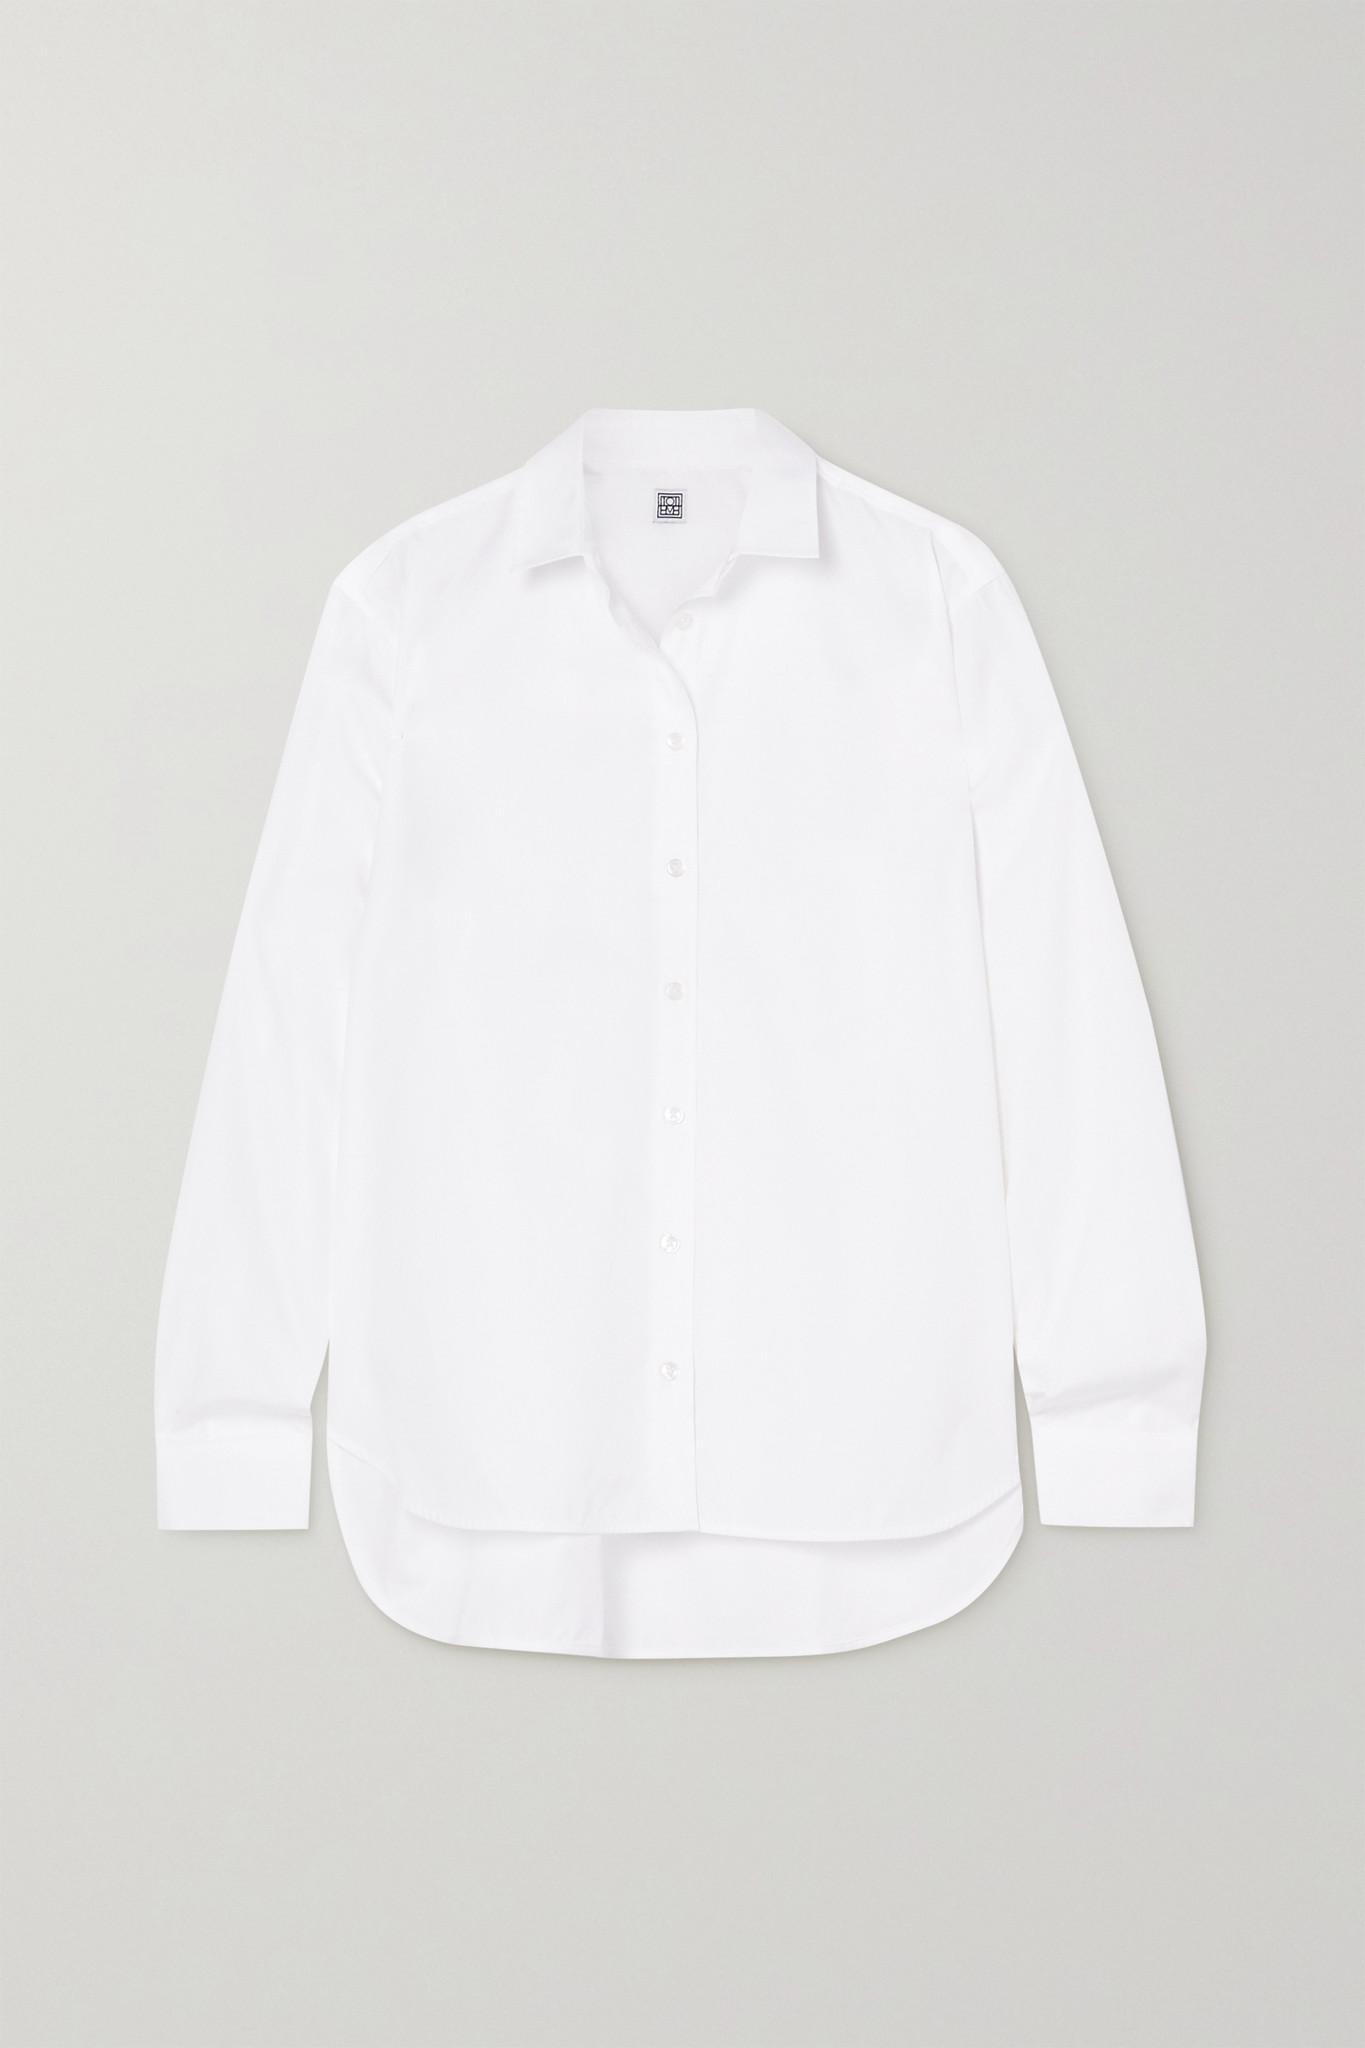 TOTÊME - Signature 纯棉府绸衬衫 - 白色 - FR40